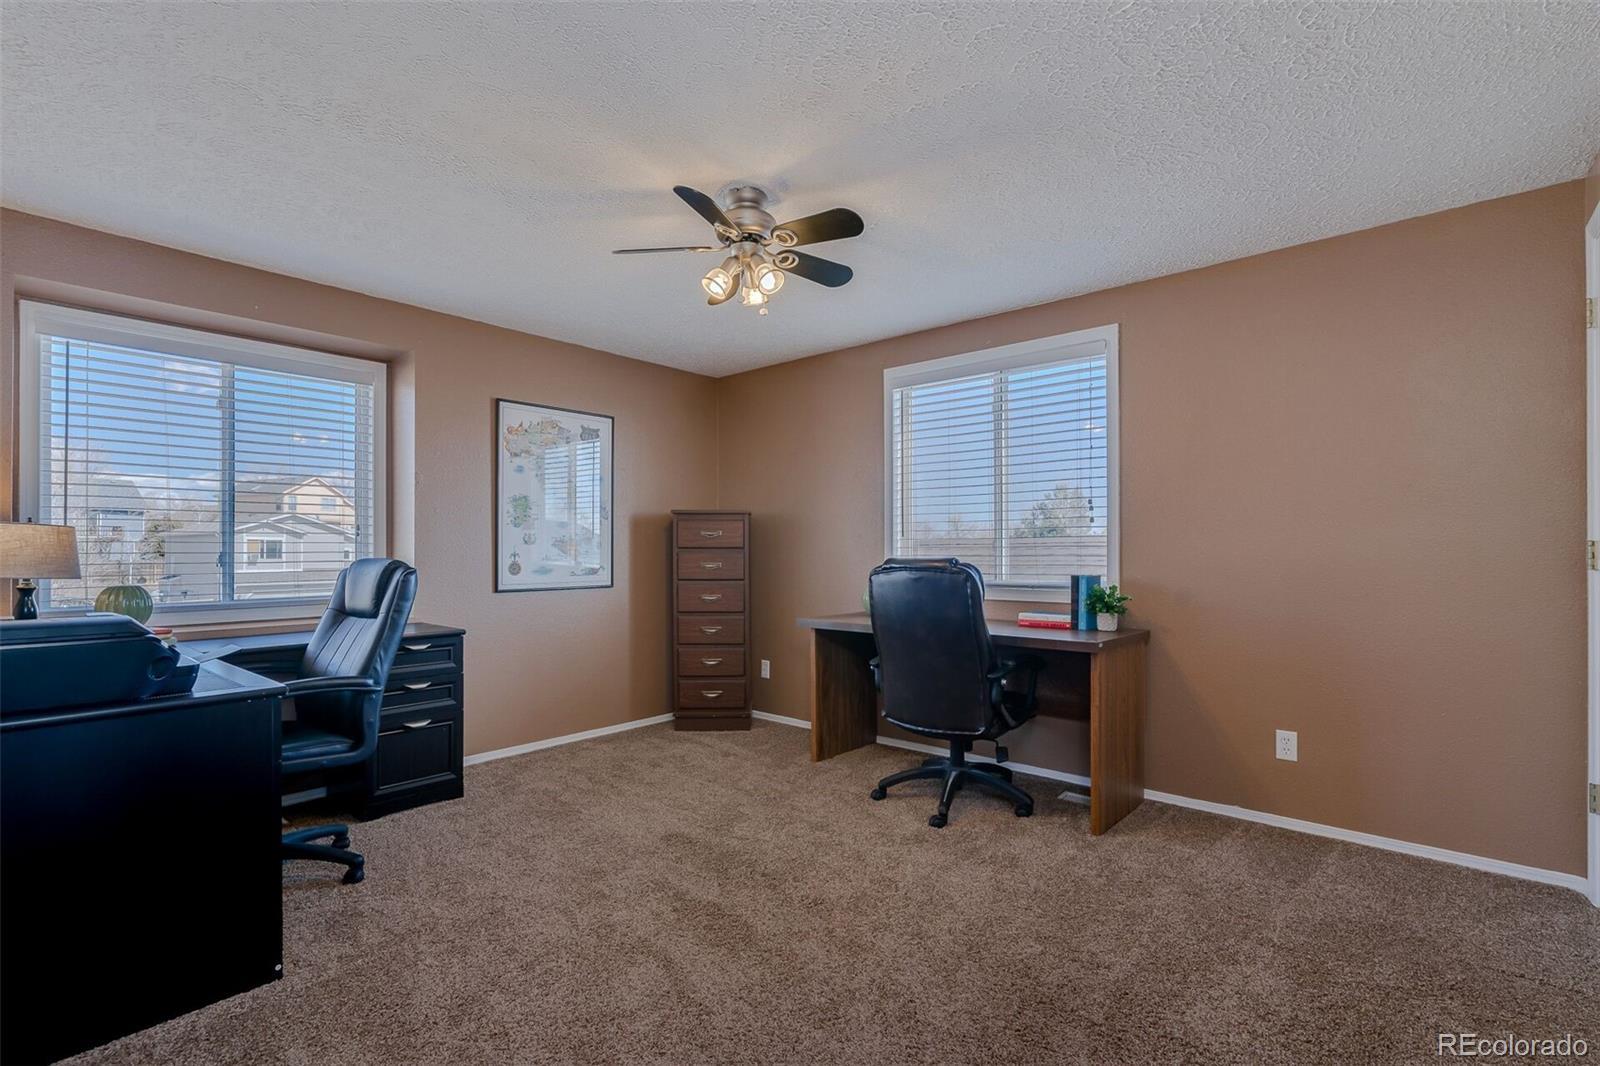 MLS# 8425770 - 32 - 6925 Battle Mountain Road, Colorado Springs, CO 80922